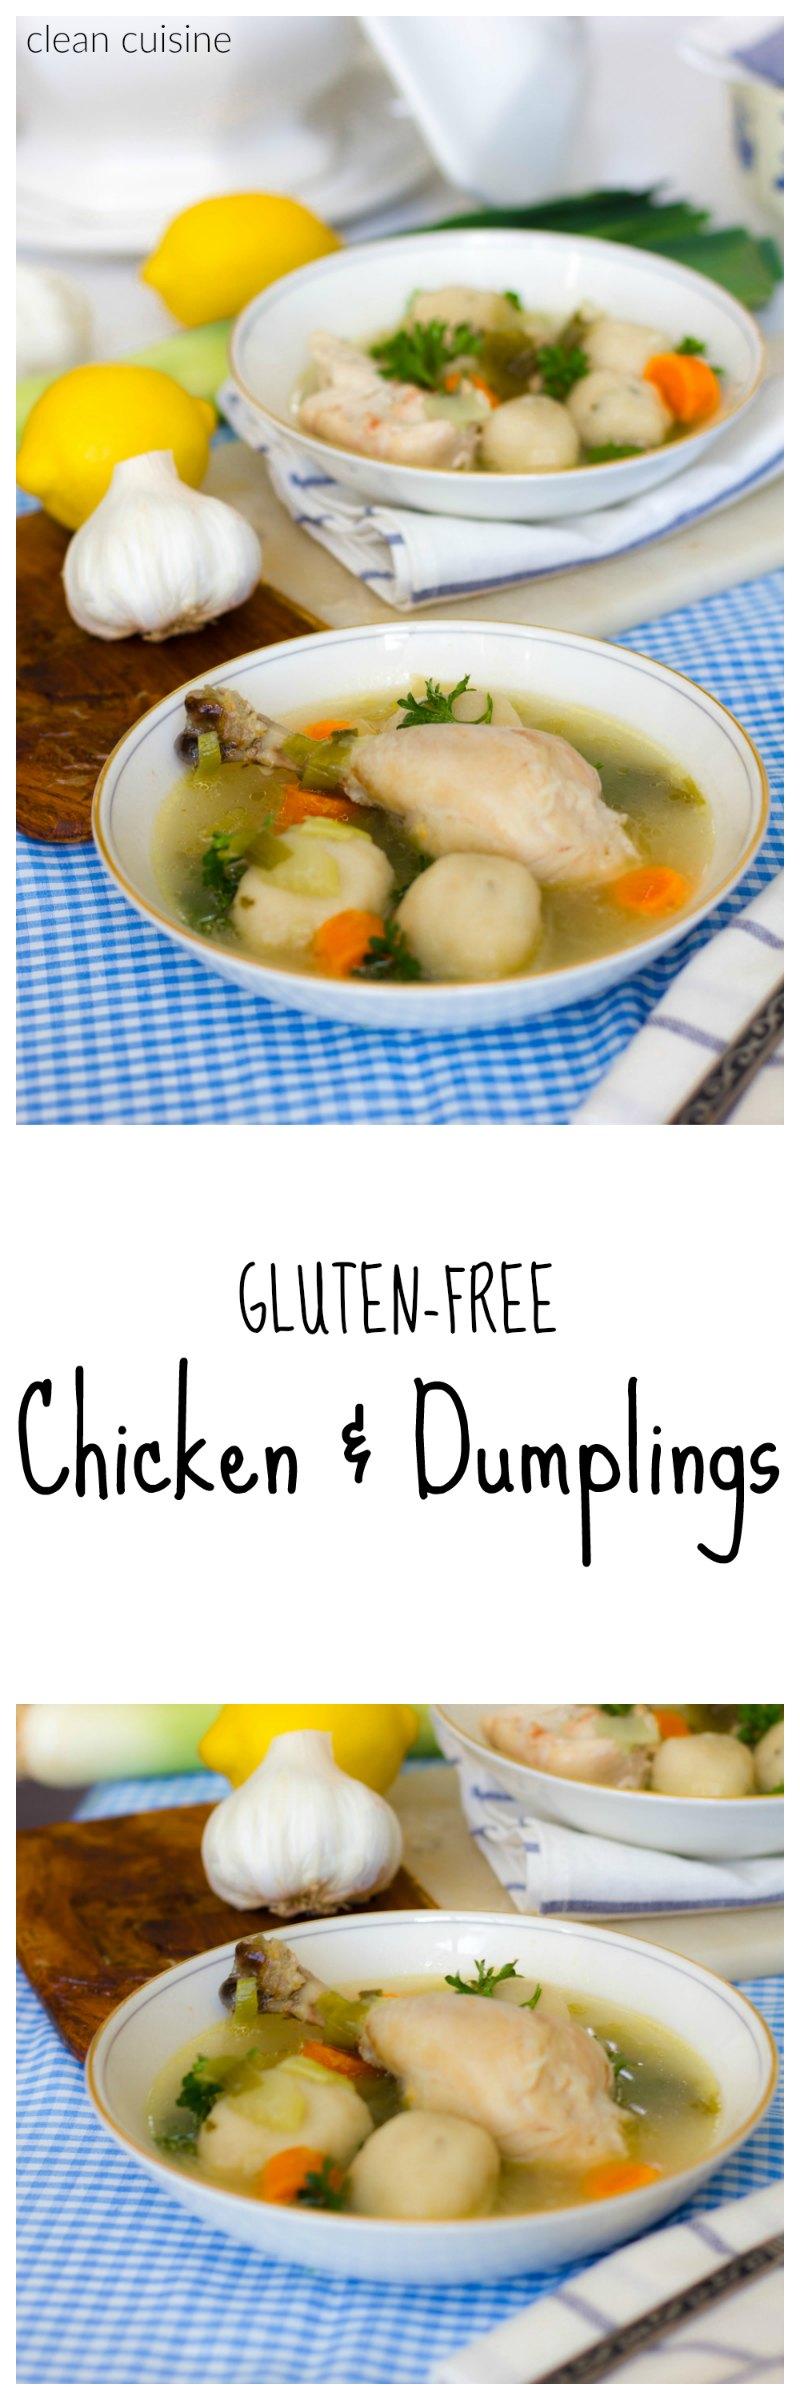 Gluten Free Chicken and Dumplings